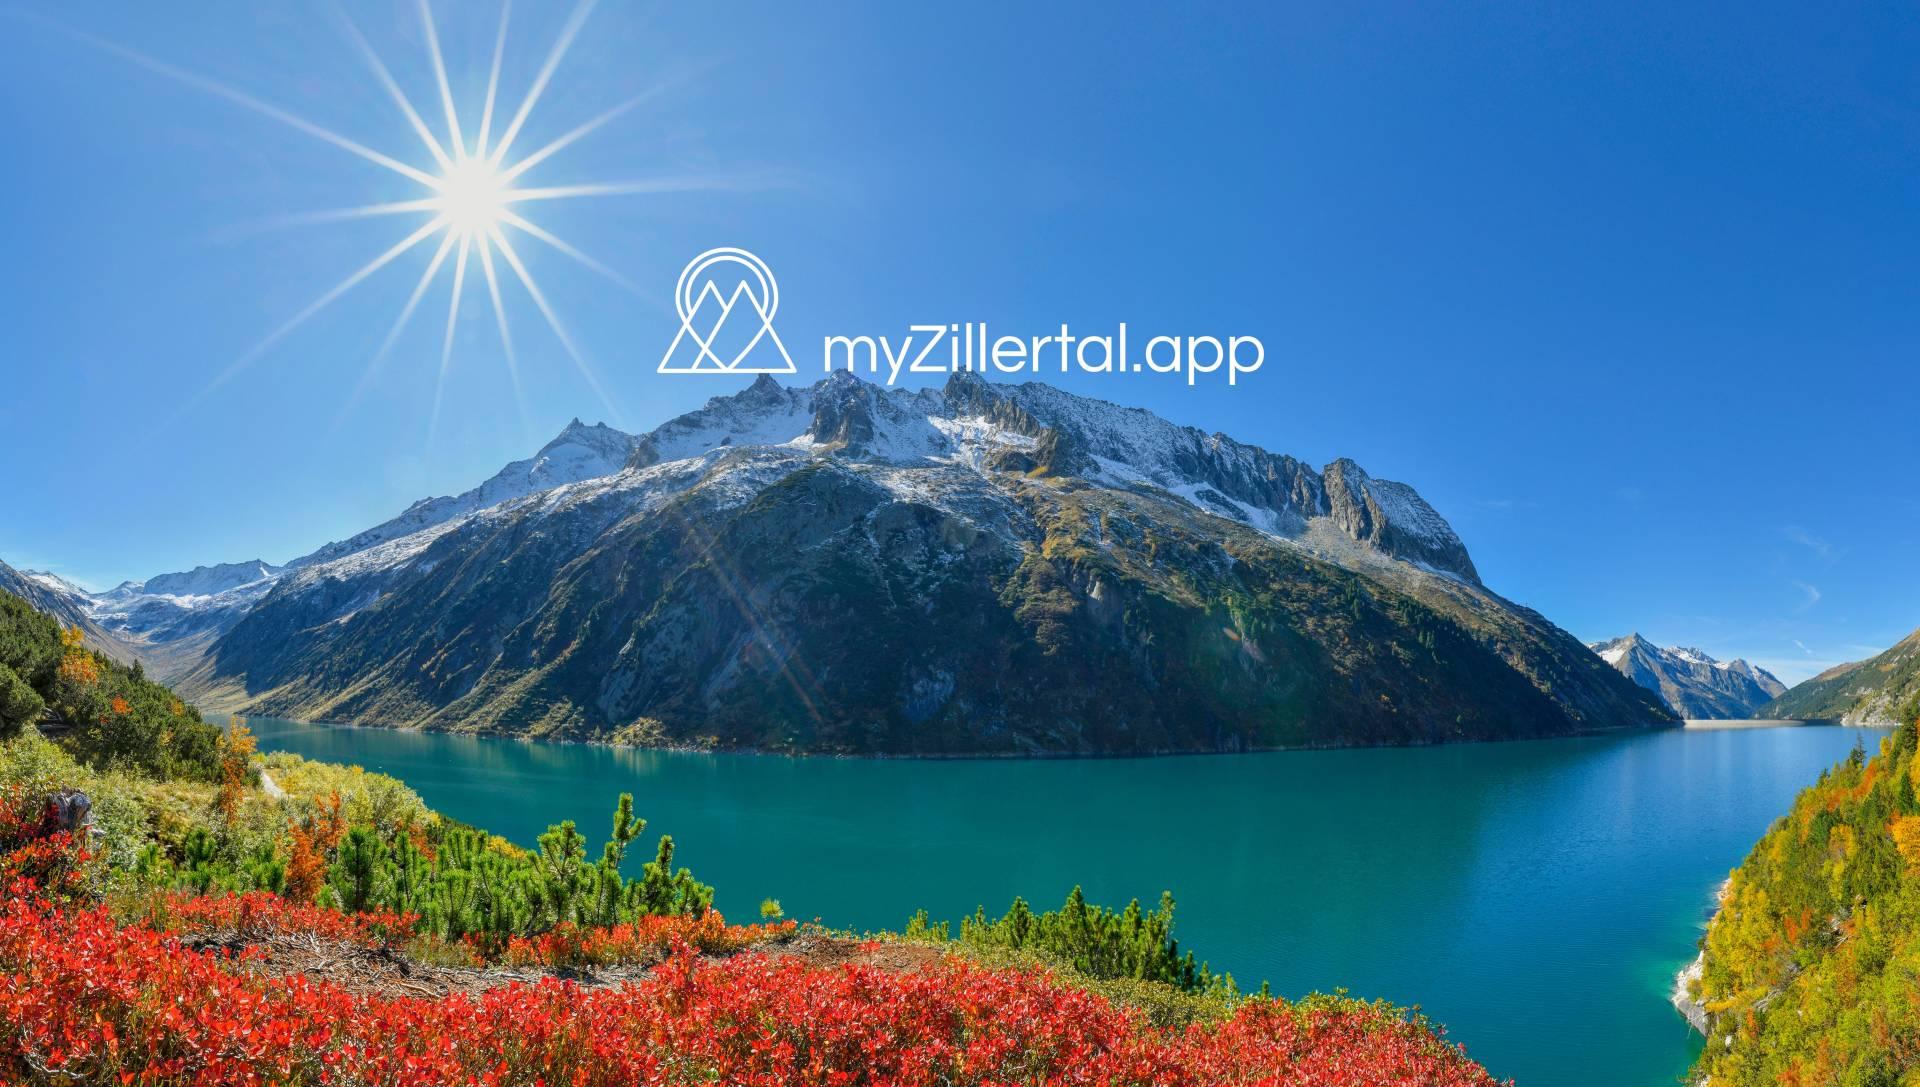 MyZillertal.app kostenlos downloaden